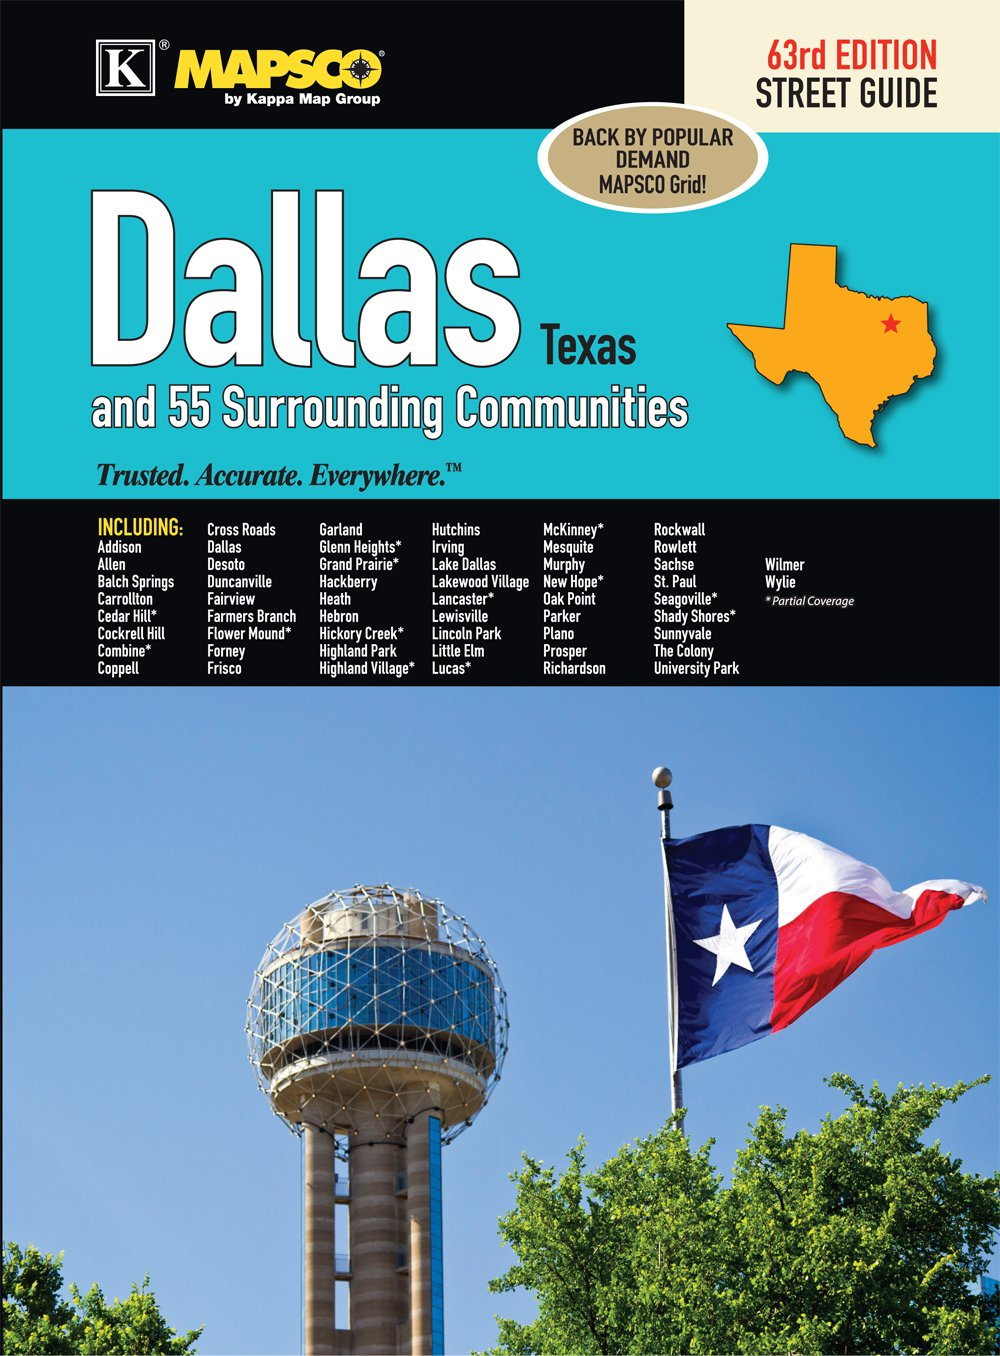 Addison Texas Zip Code Map.Dallas Tx Street Guide Kappa Map Group 9780762588121 Books